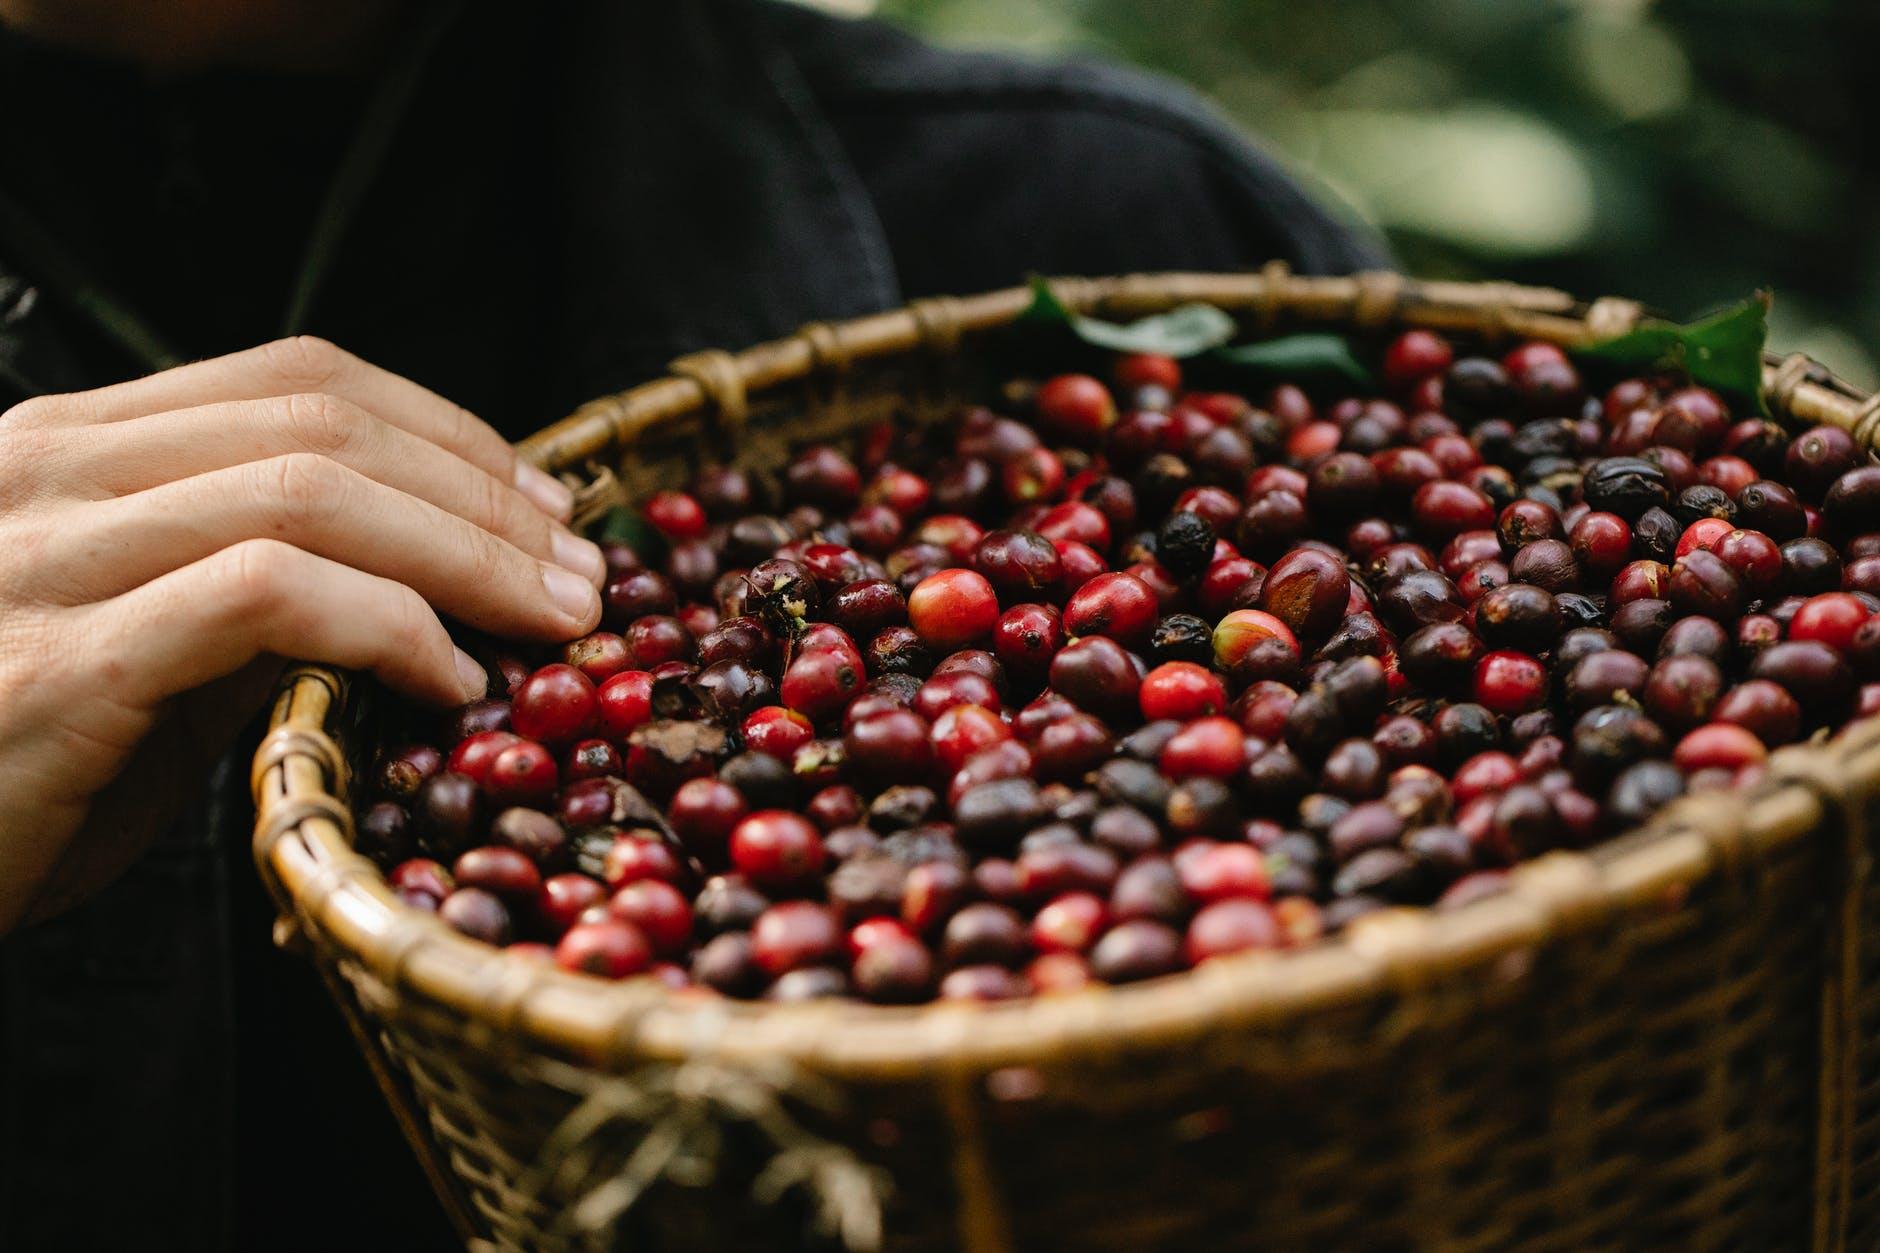 crop gardener showing wicker basket filled with red berries in farm